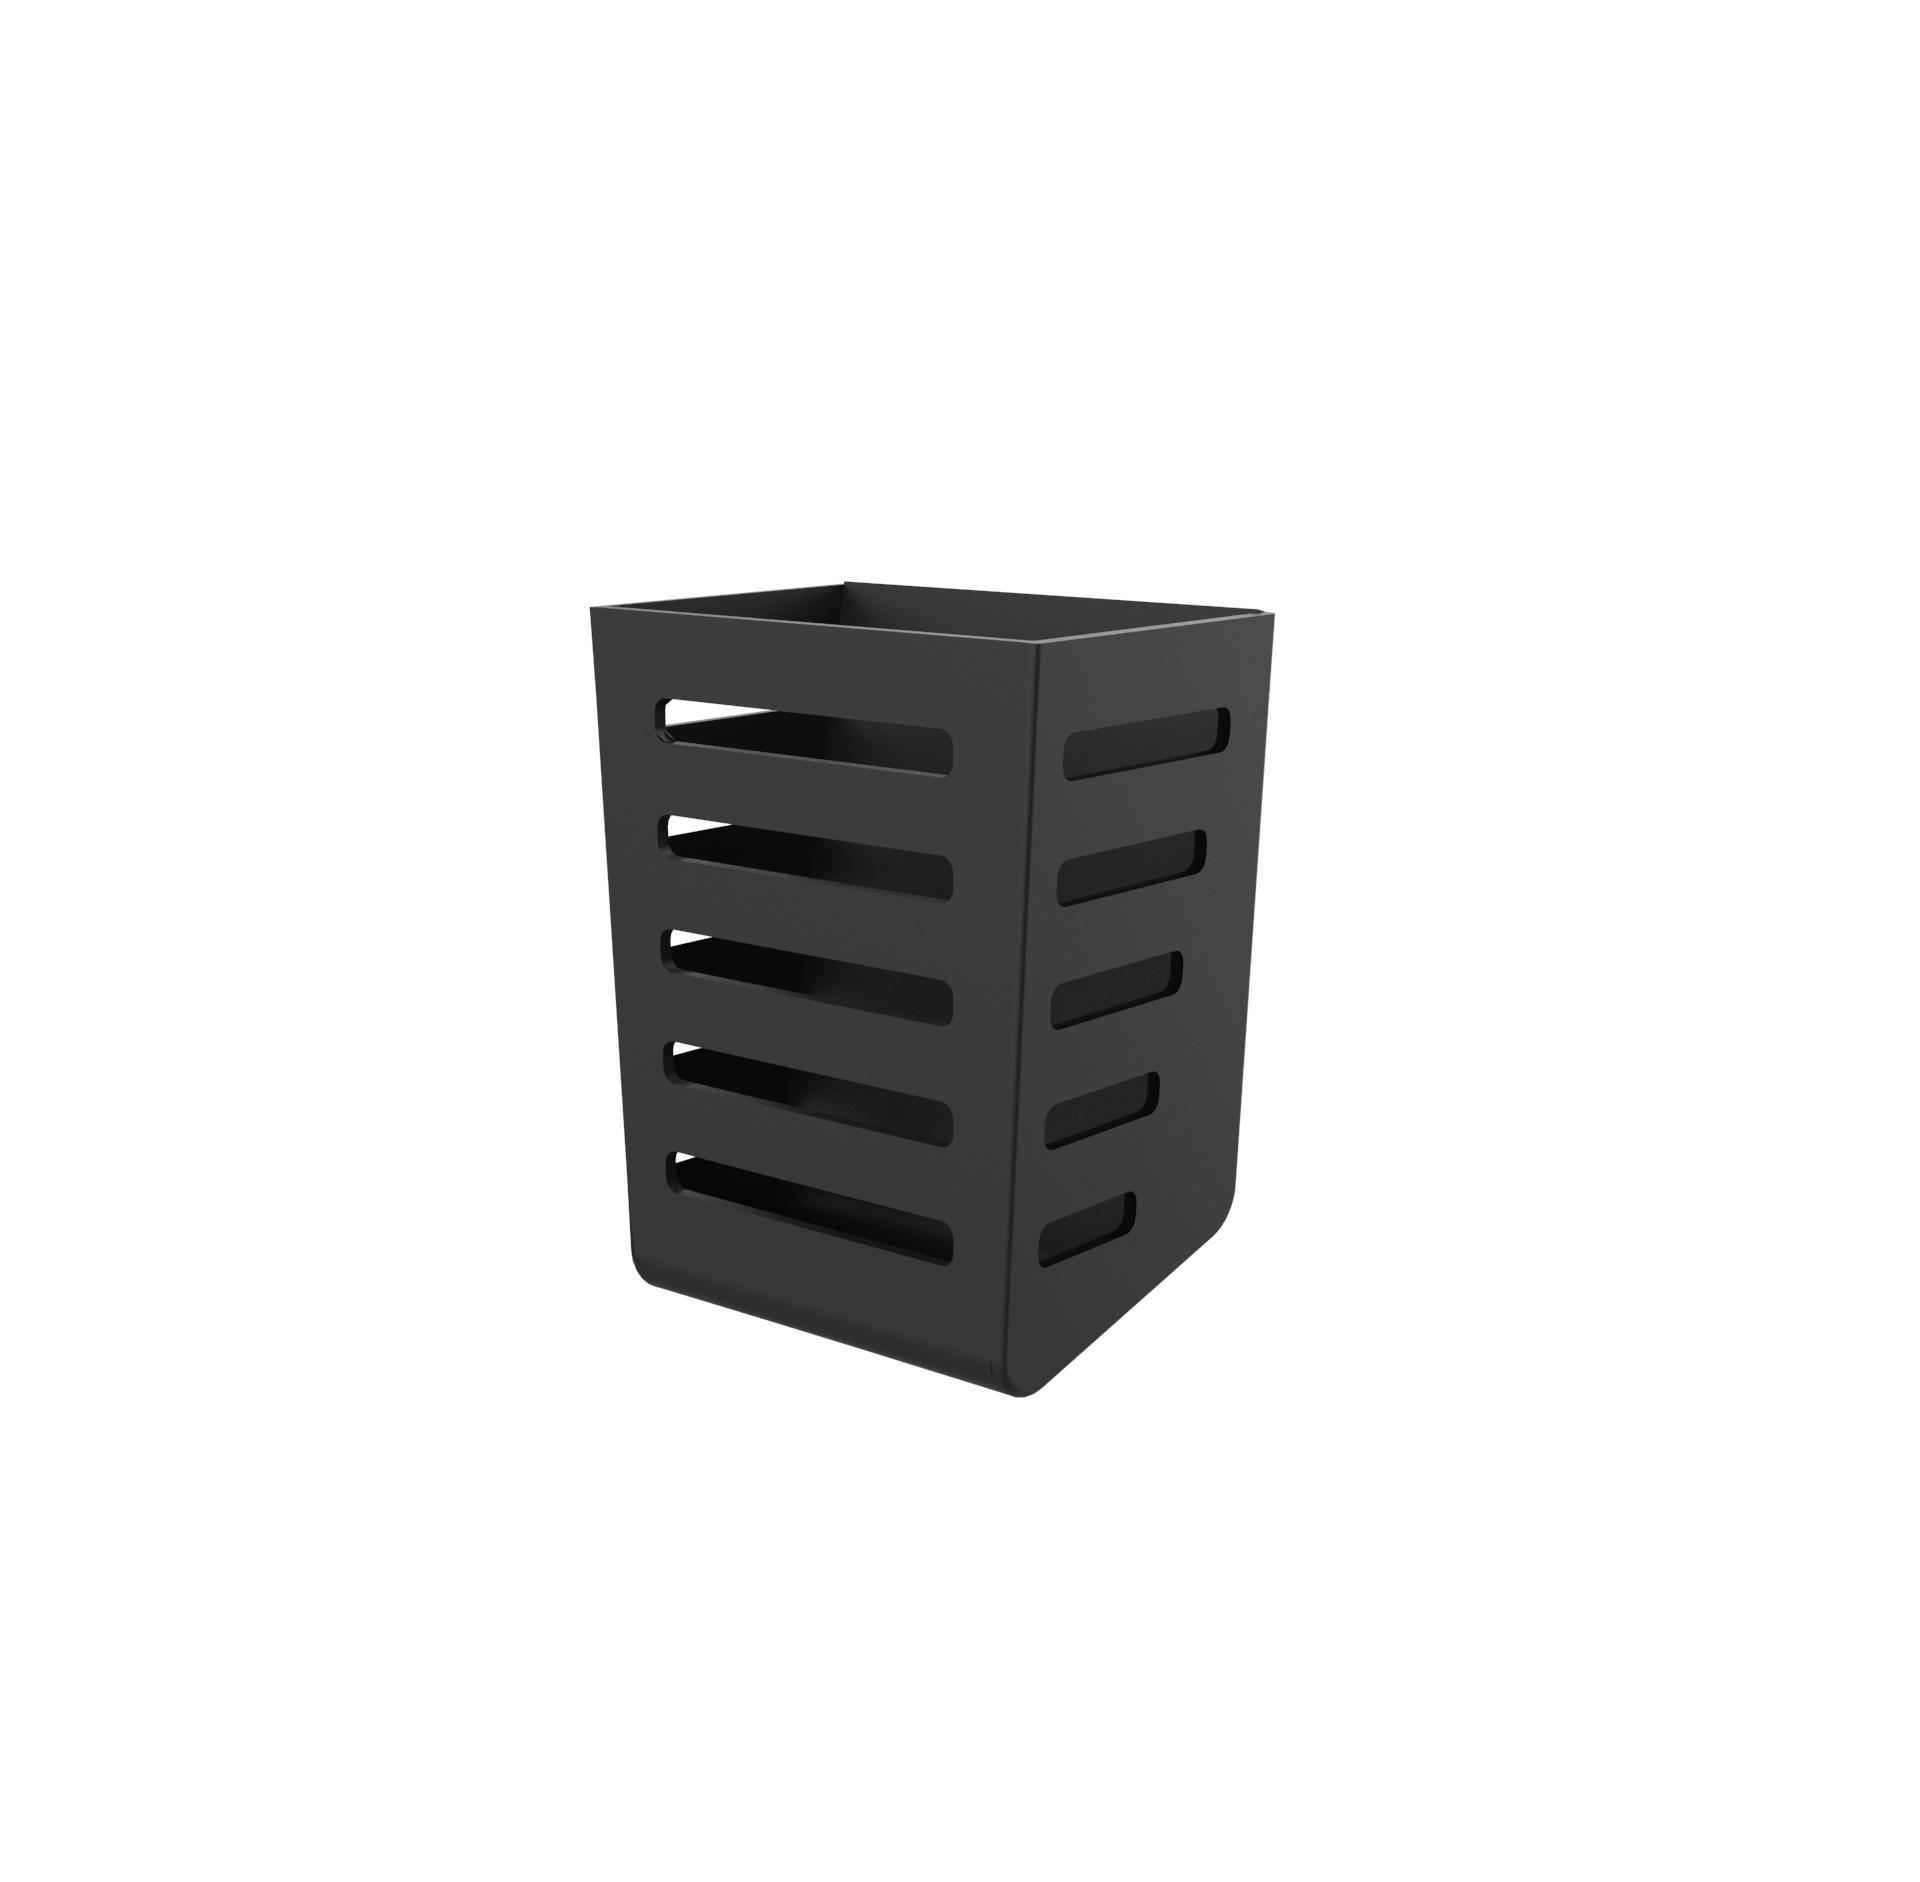 Besteck-Halter, ABS / black